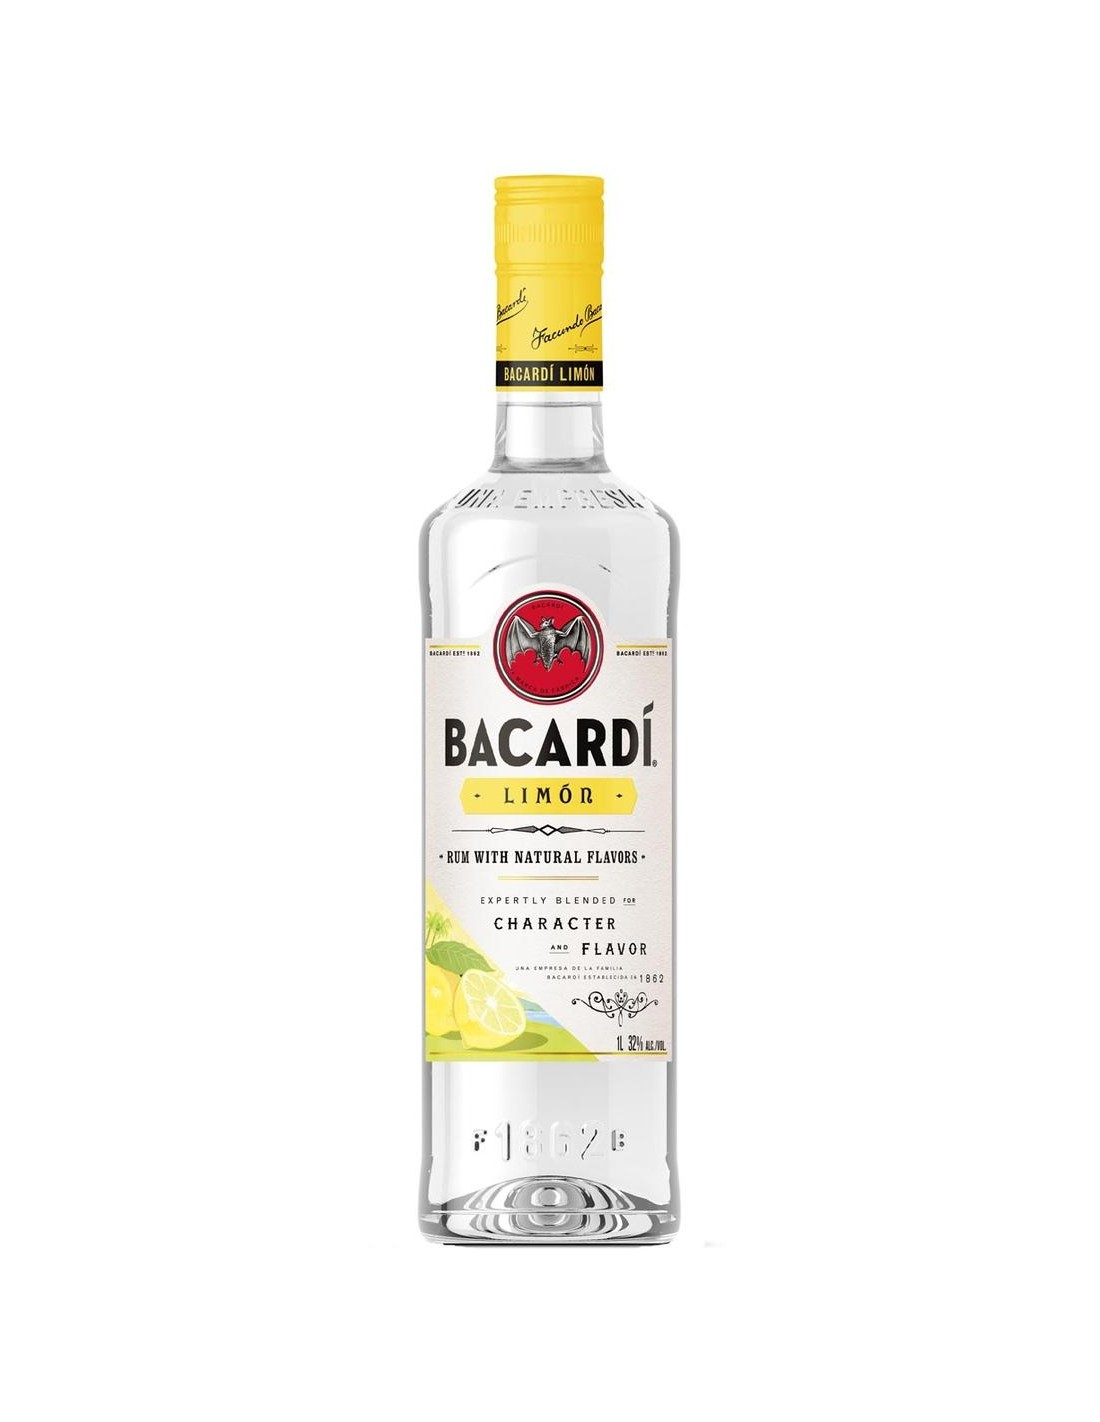 Rom Bacardi Limon, 1L, 32% alc., Cuba